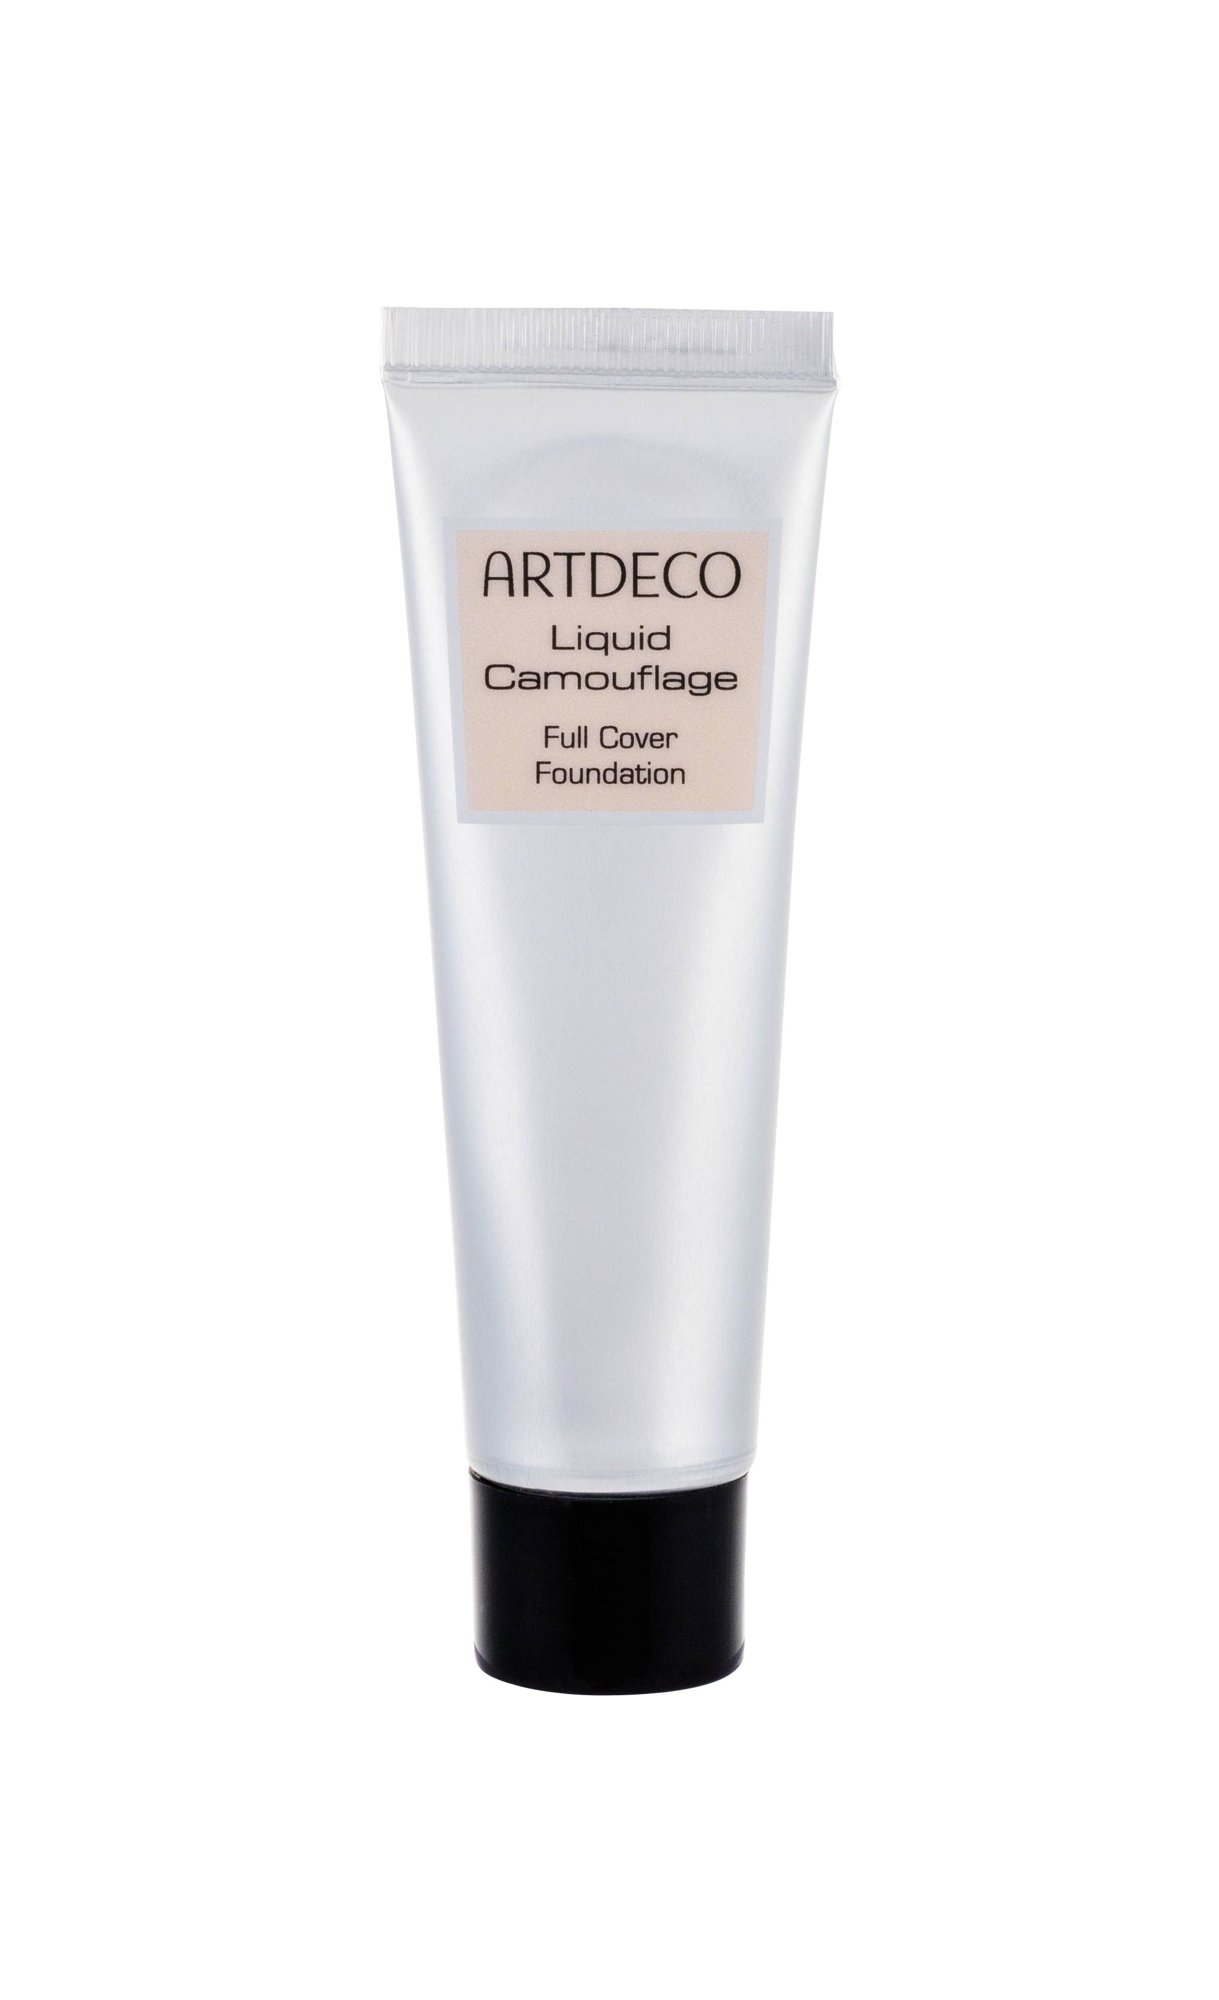 Artdeco Liquid Camouflage Makeup 25ml 60 Light Vanilla